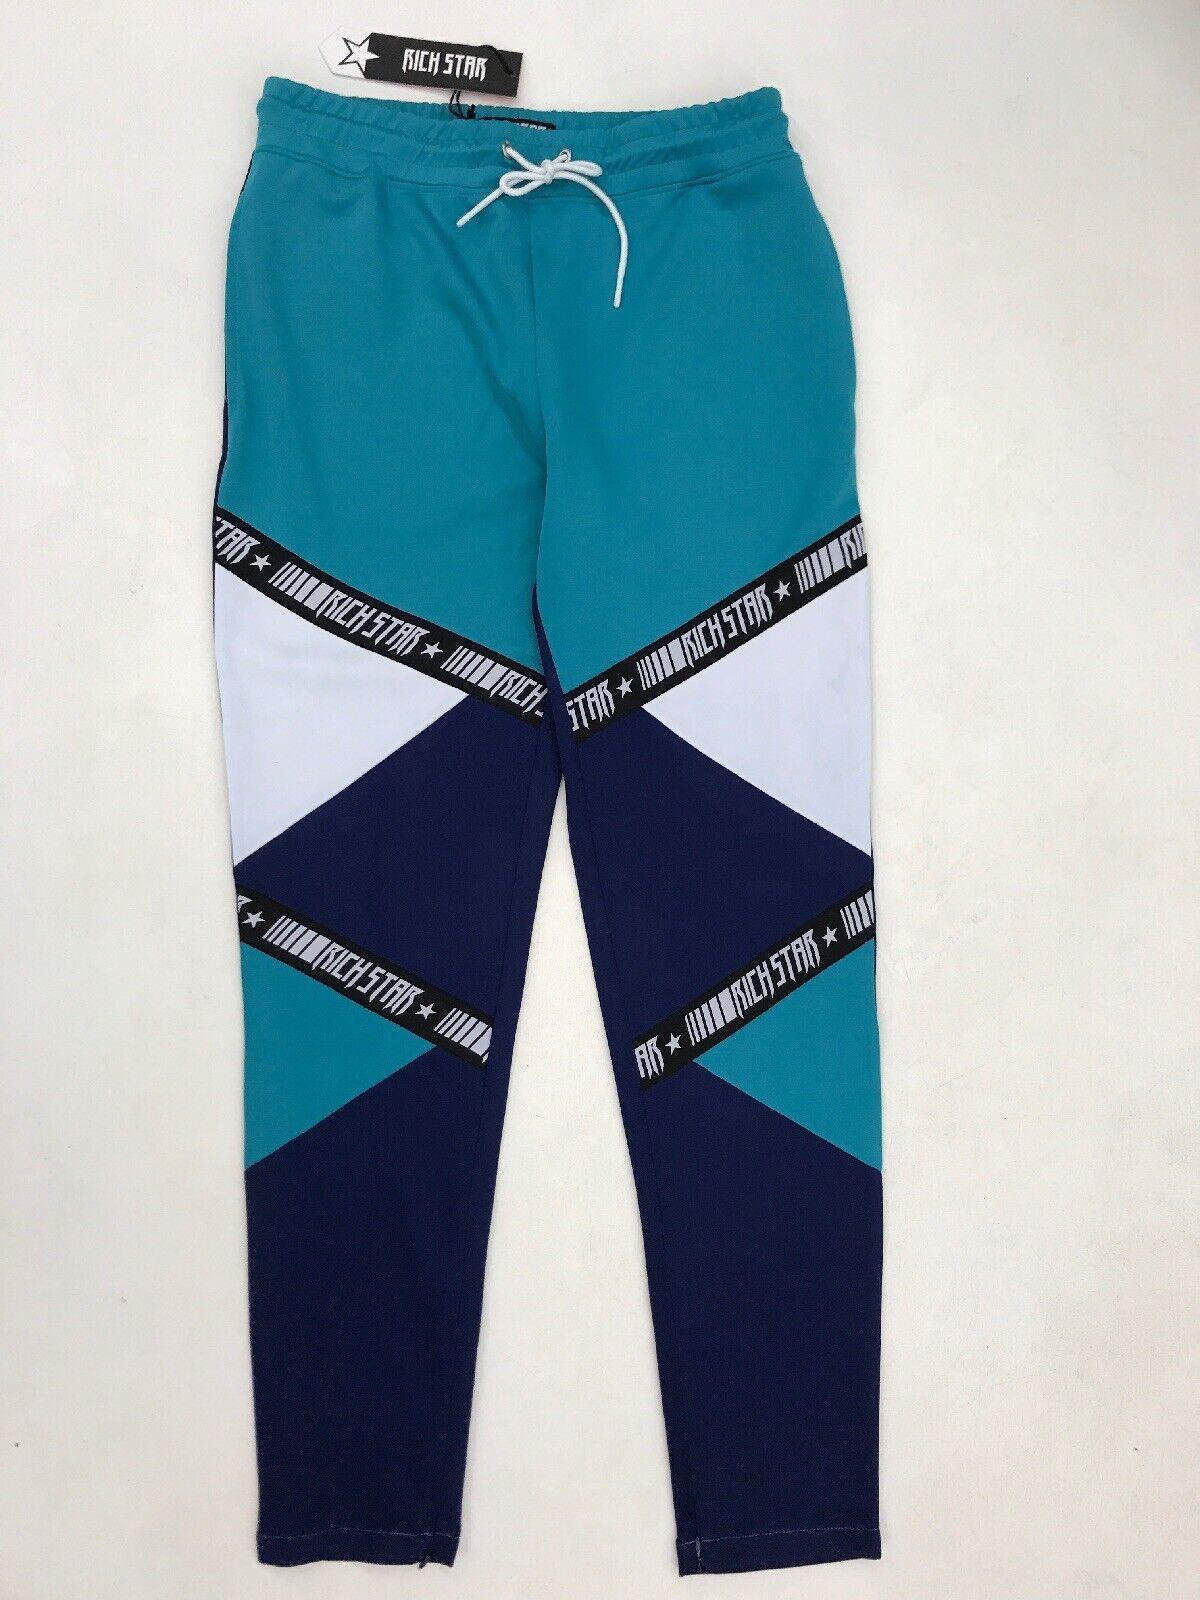 Rich Star Chevron Tape Pants Navy Mens Sample Large Nice New Rare 1 Of 1